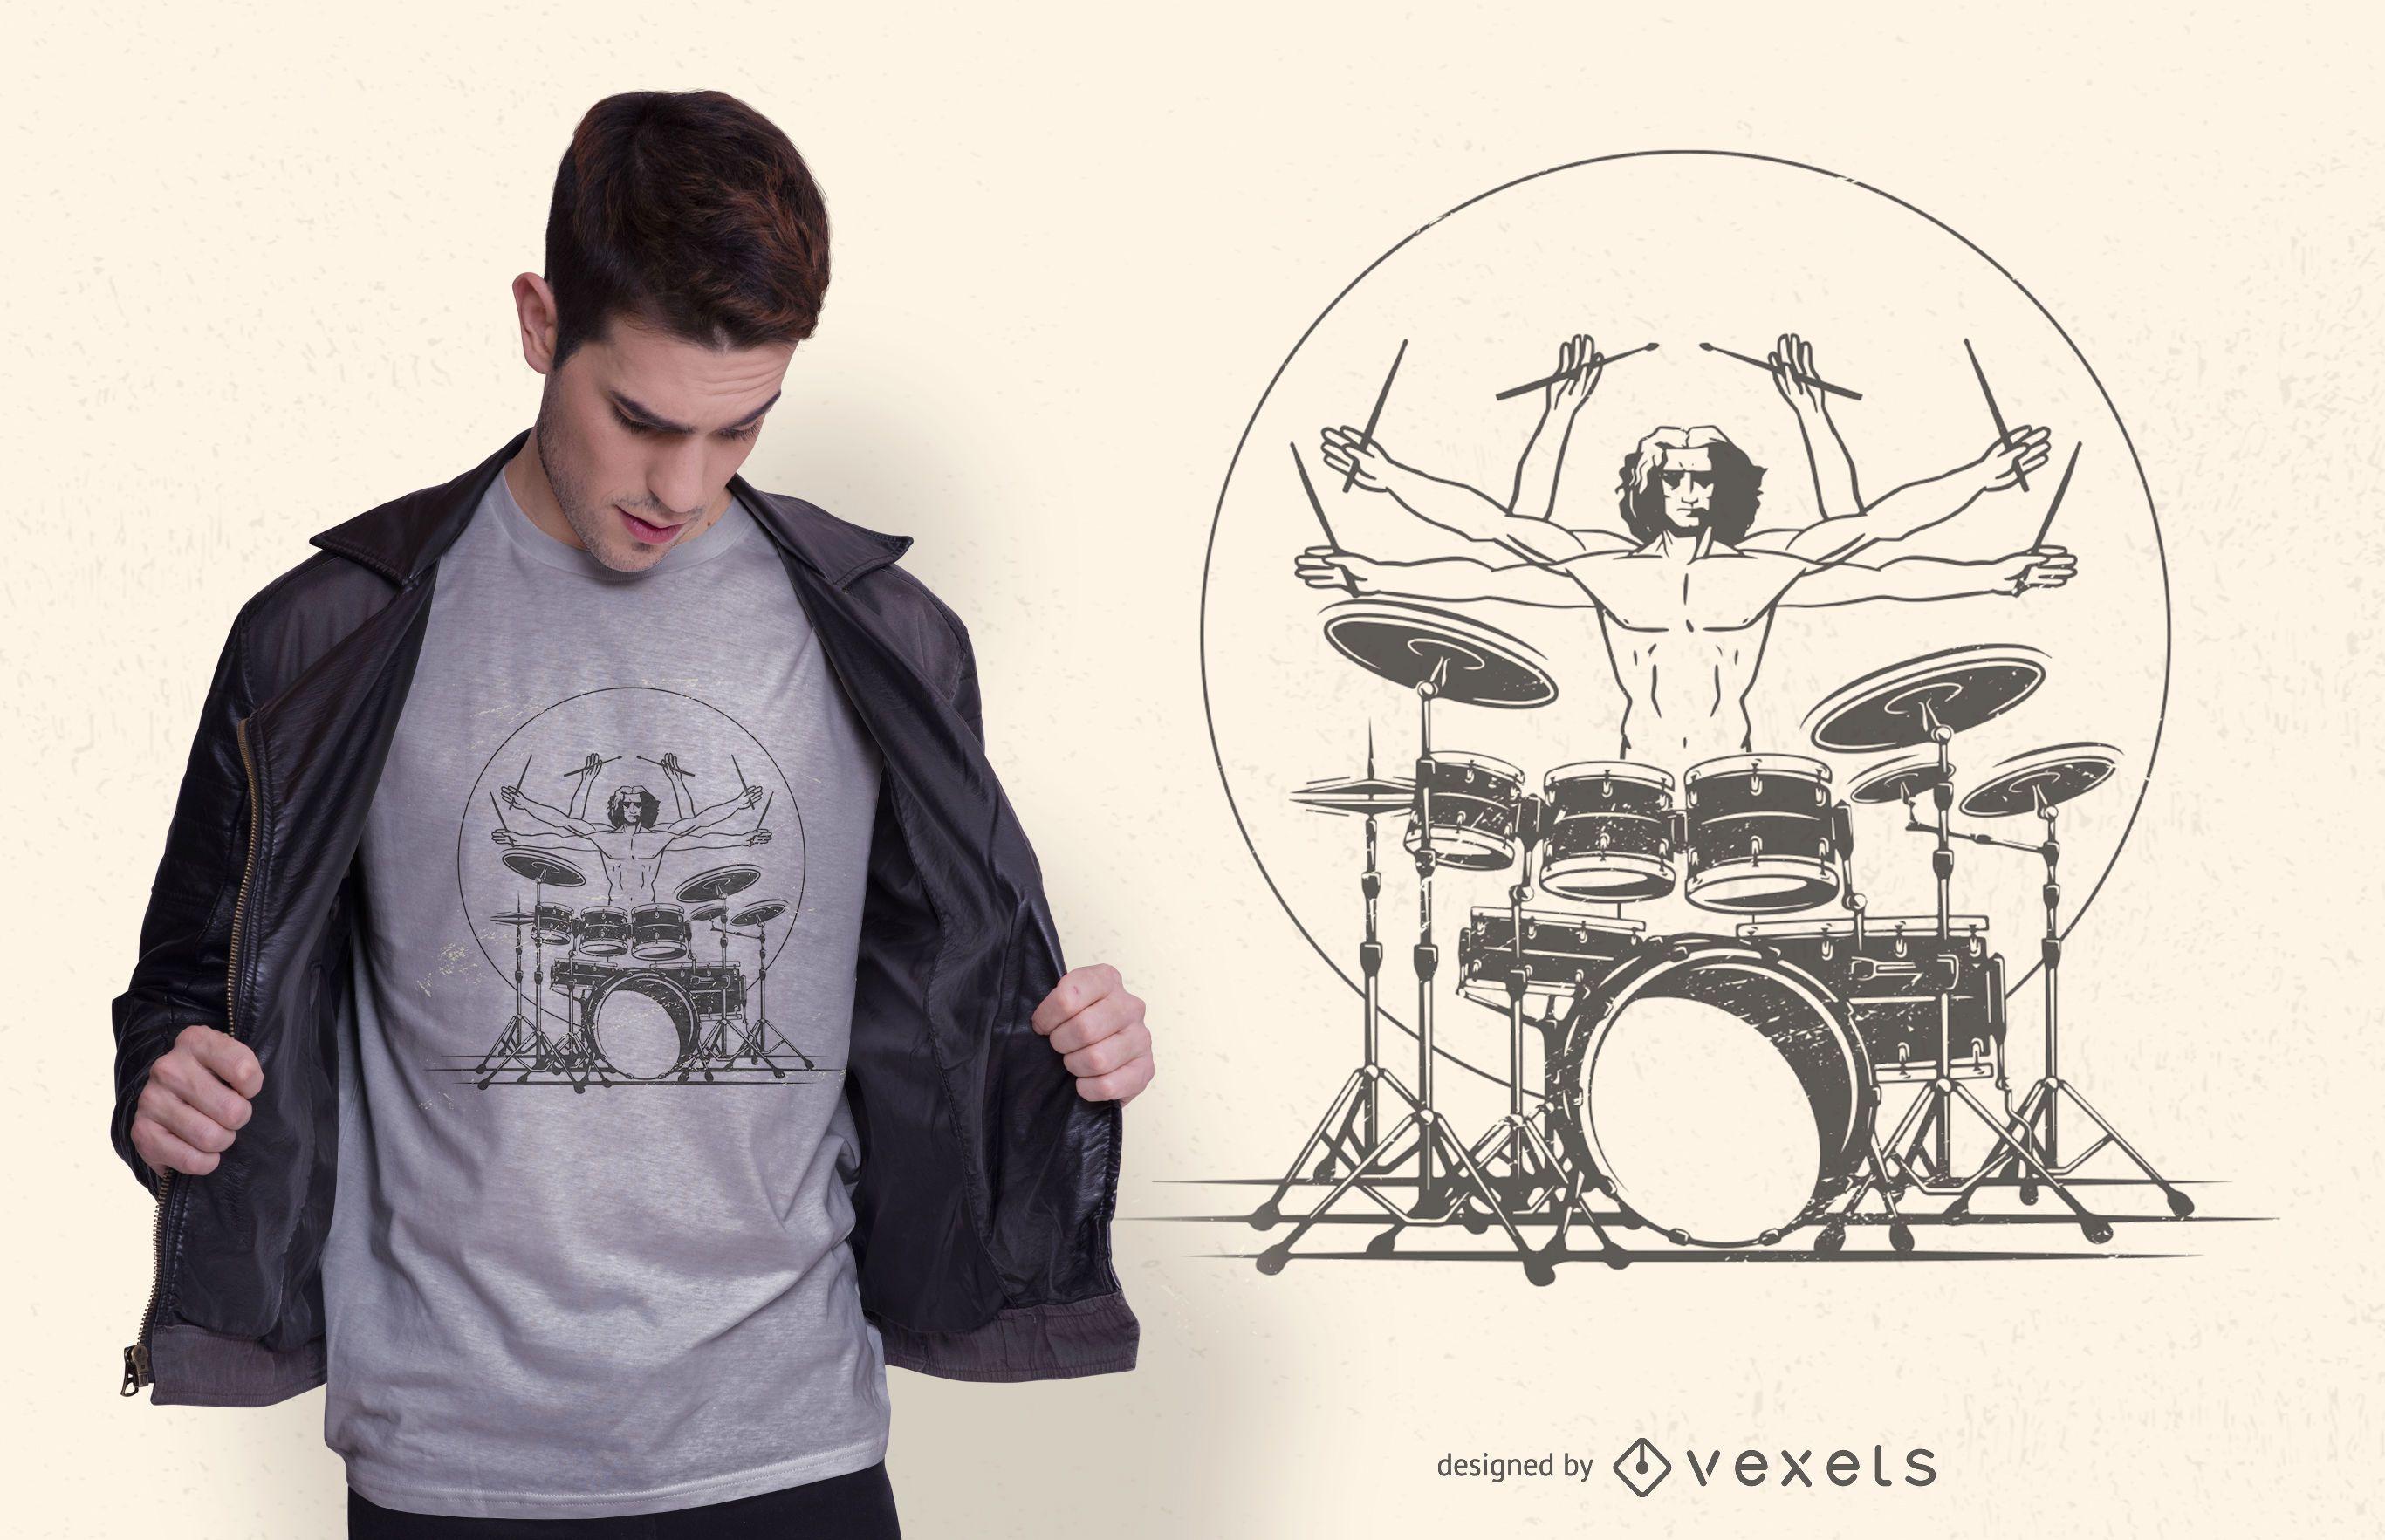 Drummer playing t-shirt design